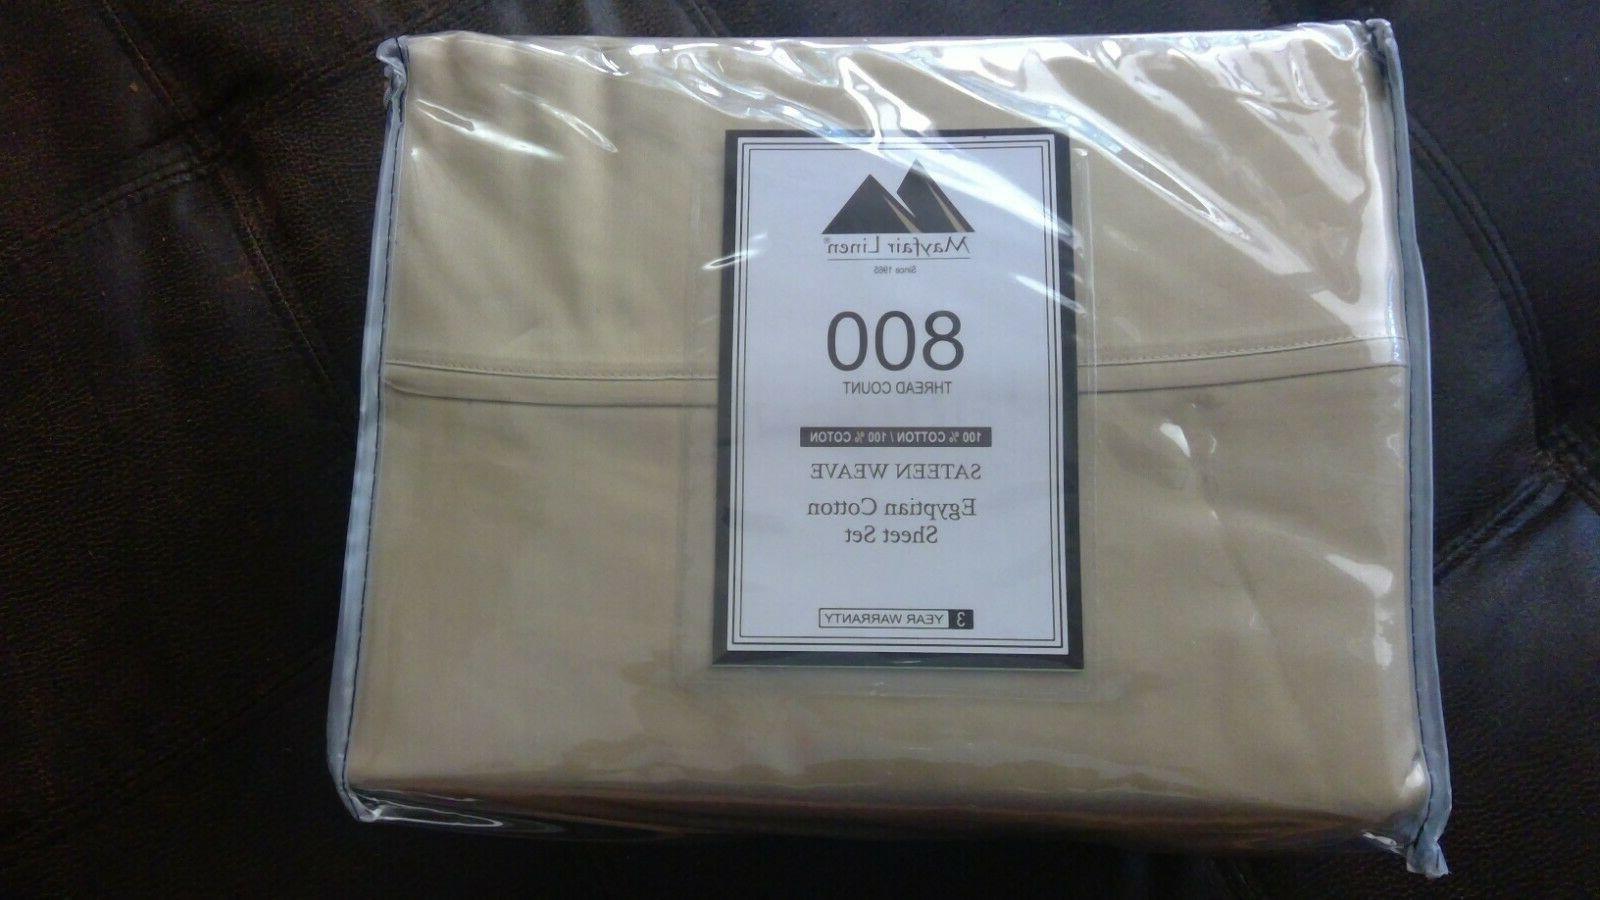 800 thread count 100 percent egyptian cotton